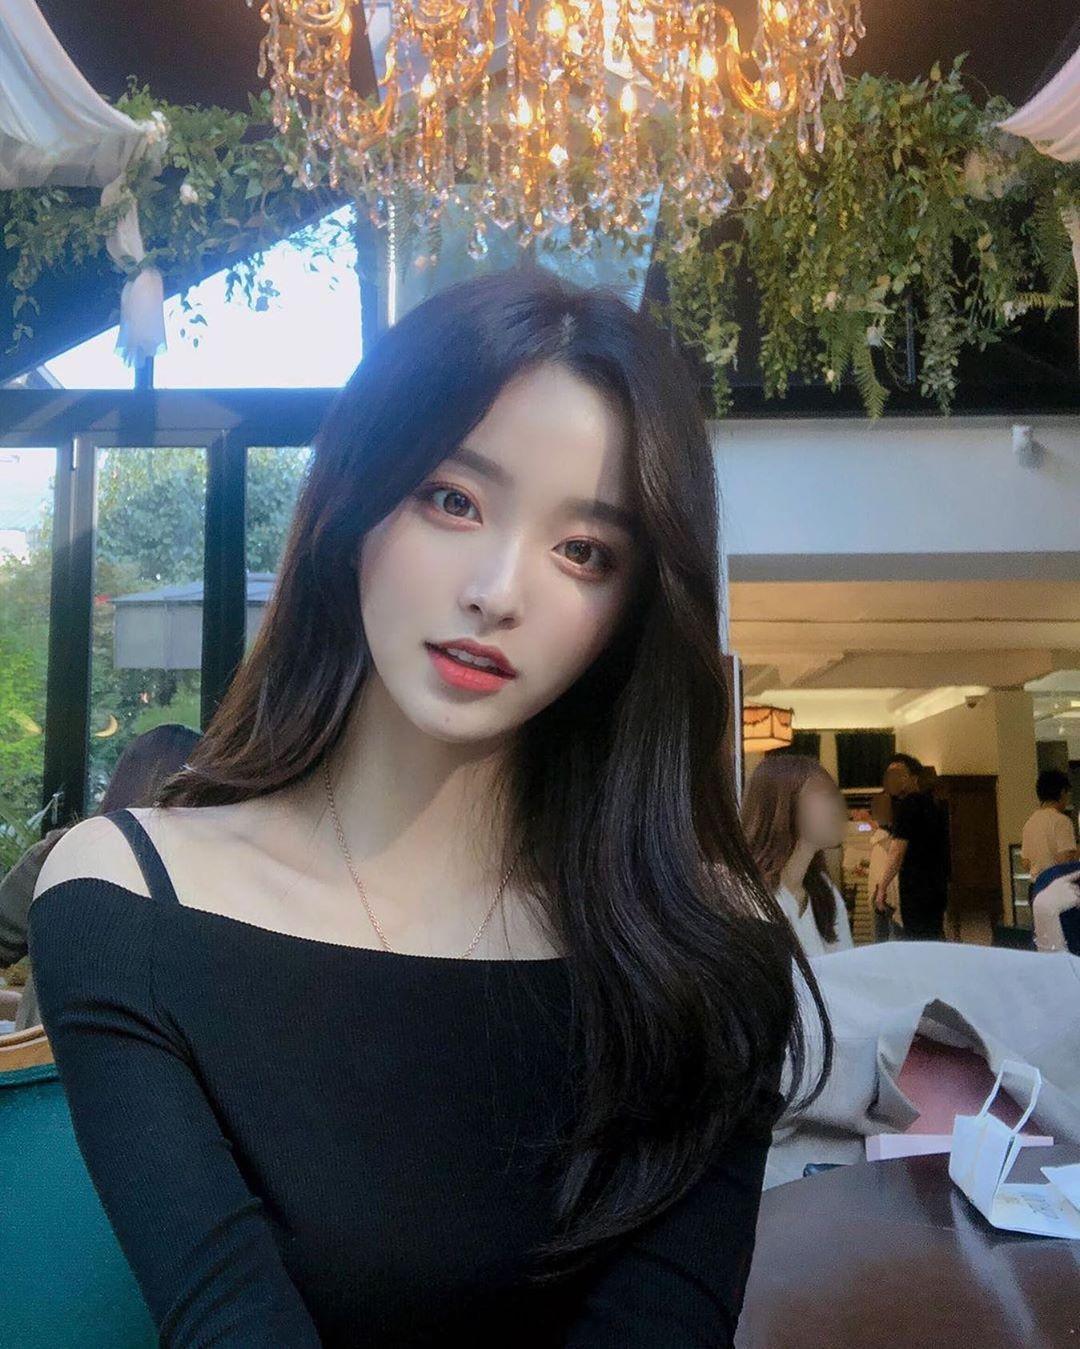 kim nahee | 김나희 | 아시안 메이크업, 소녀 문신, 귀여운 한국 소녀